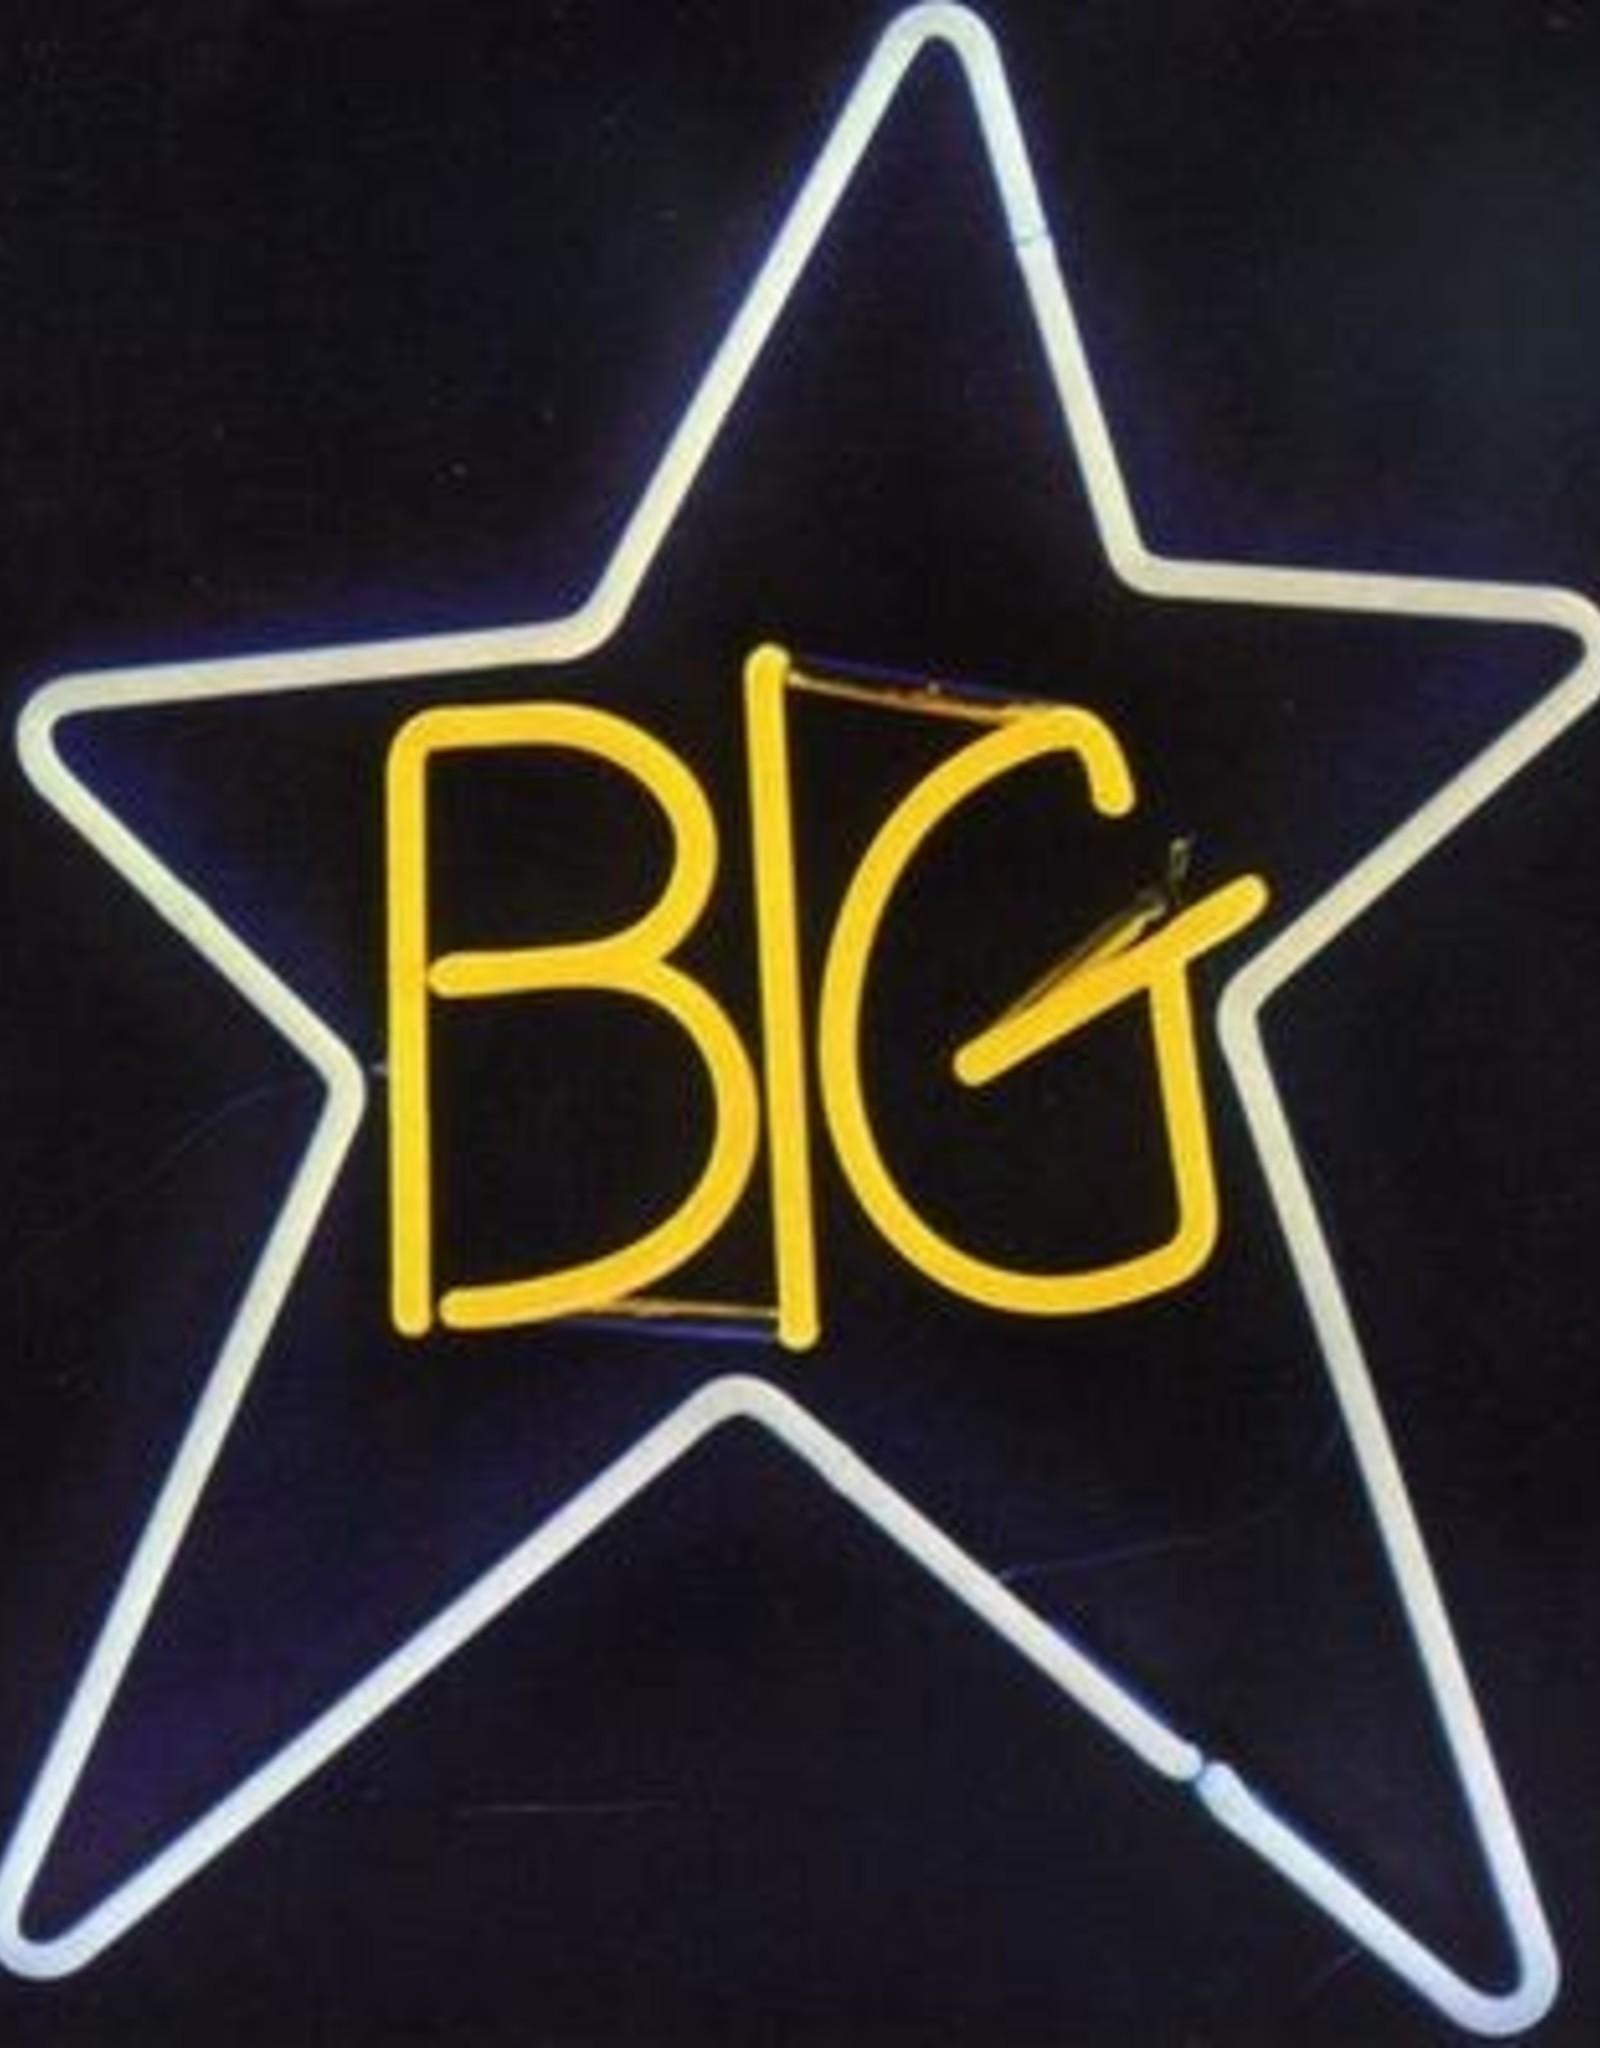 Big Star - #1 Record (180 Gram)